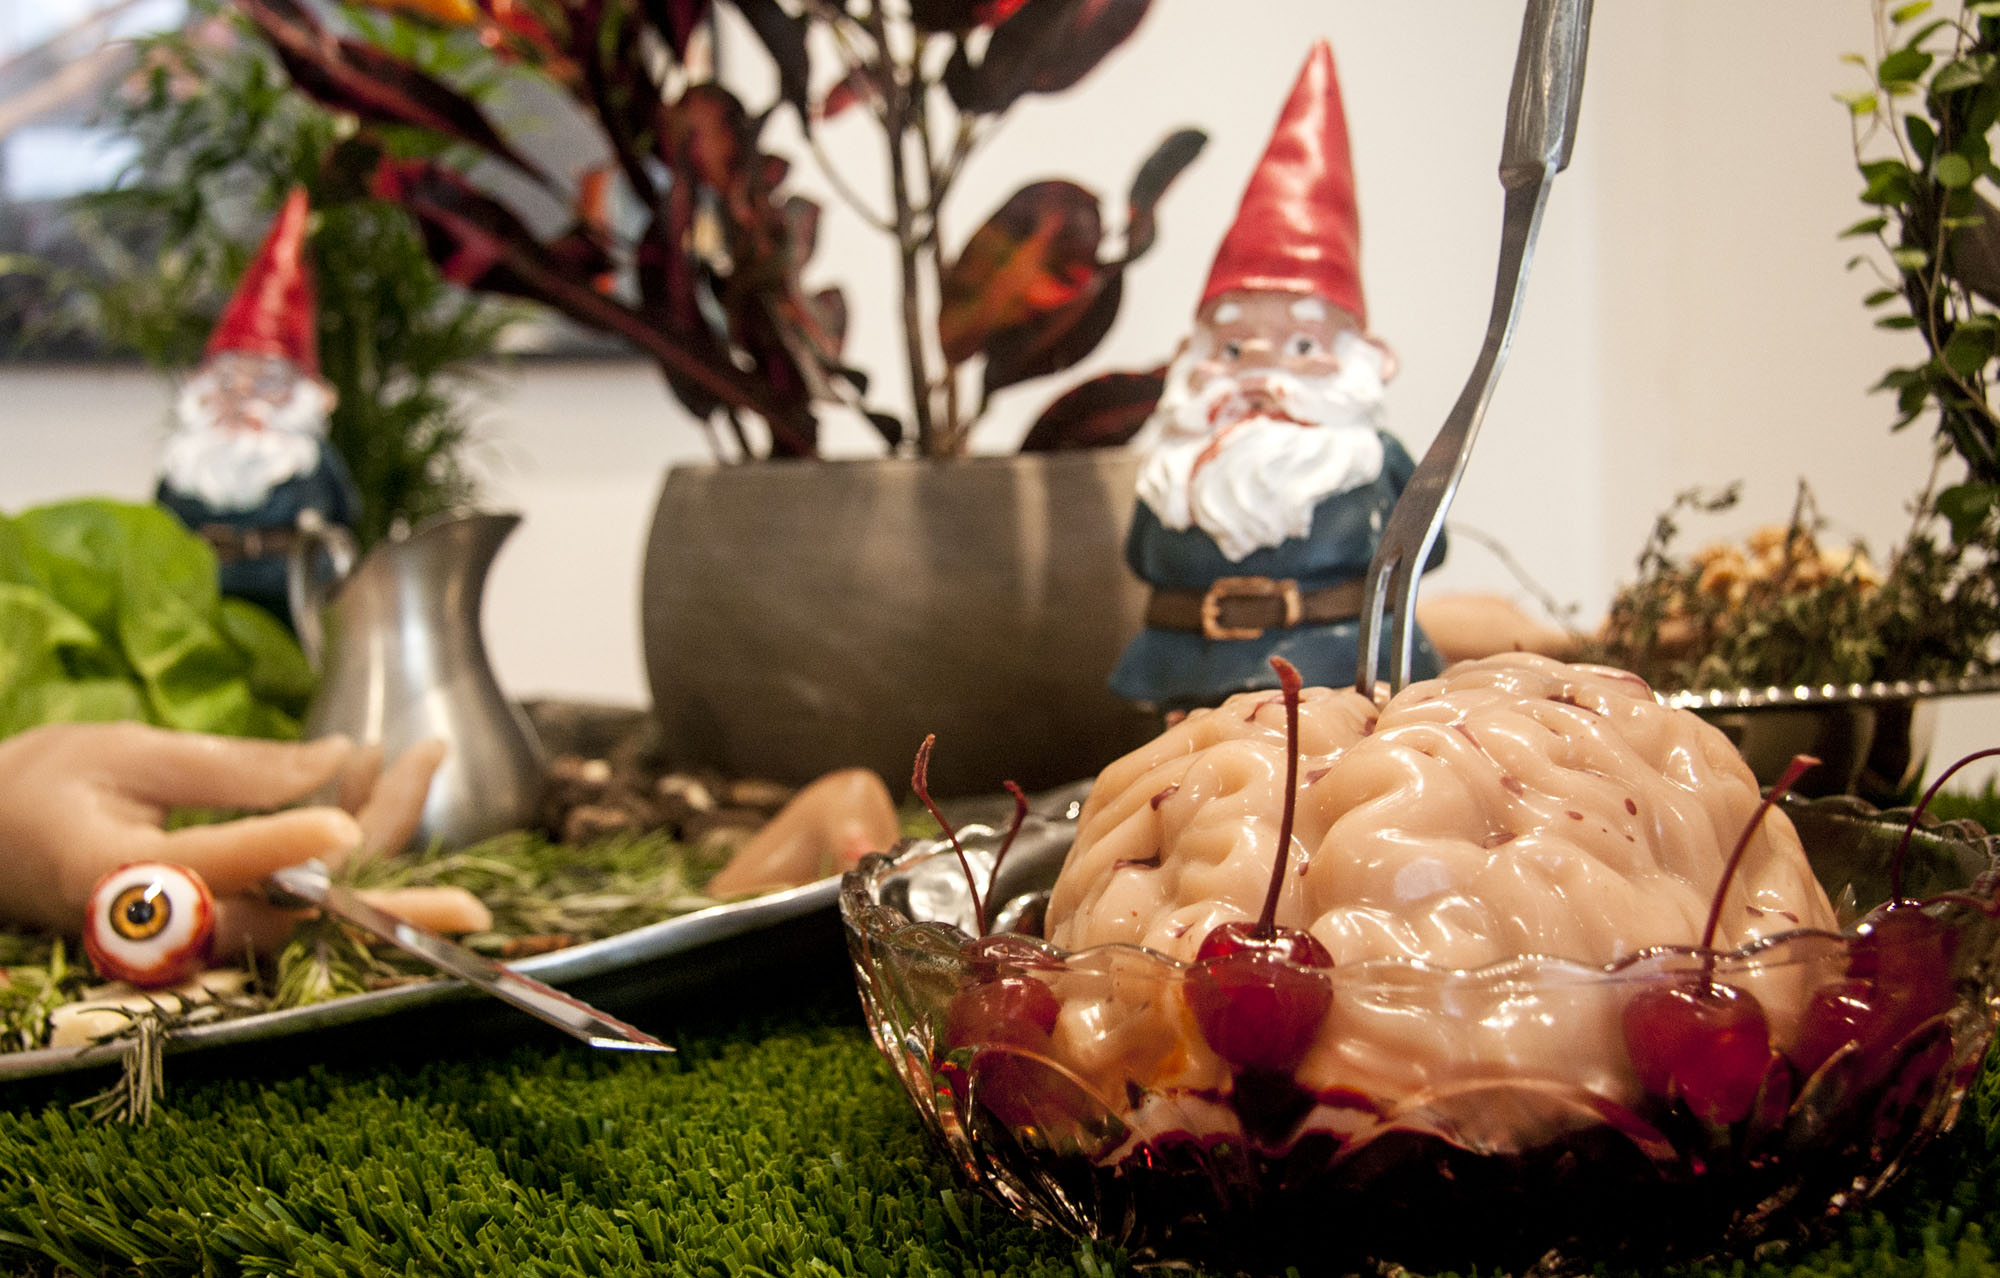 Garden Party: Post-Gnome Apocalypse, detail